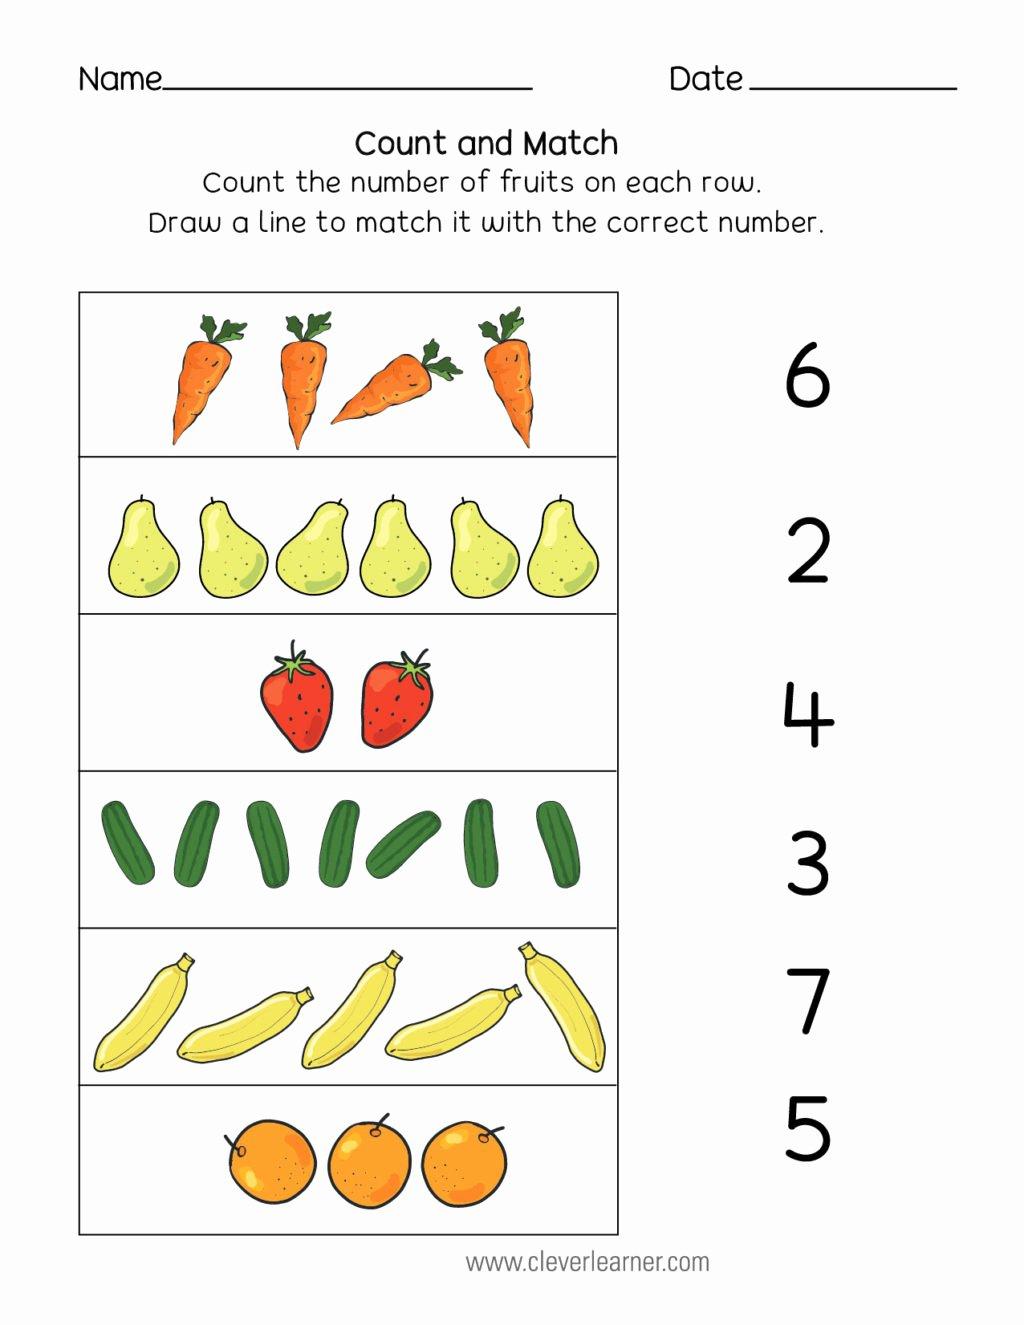 Worksheets For Preschoolers Matching